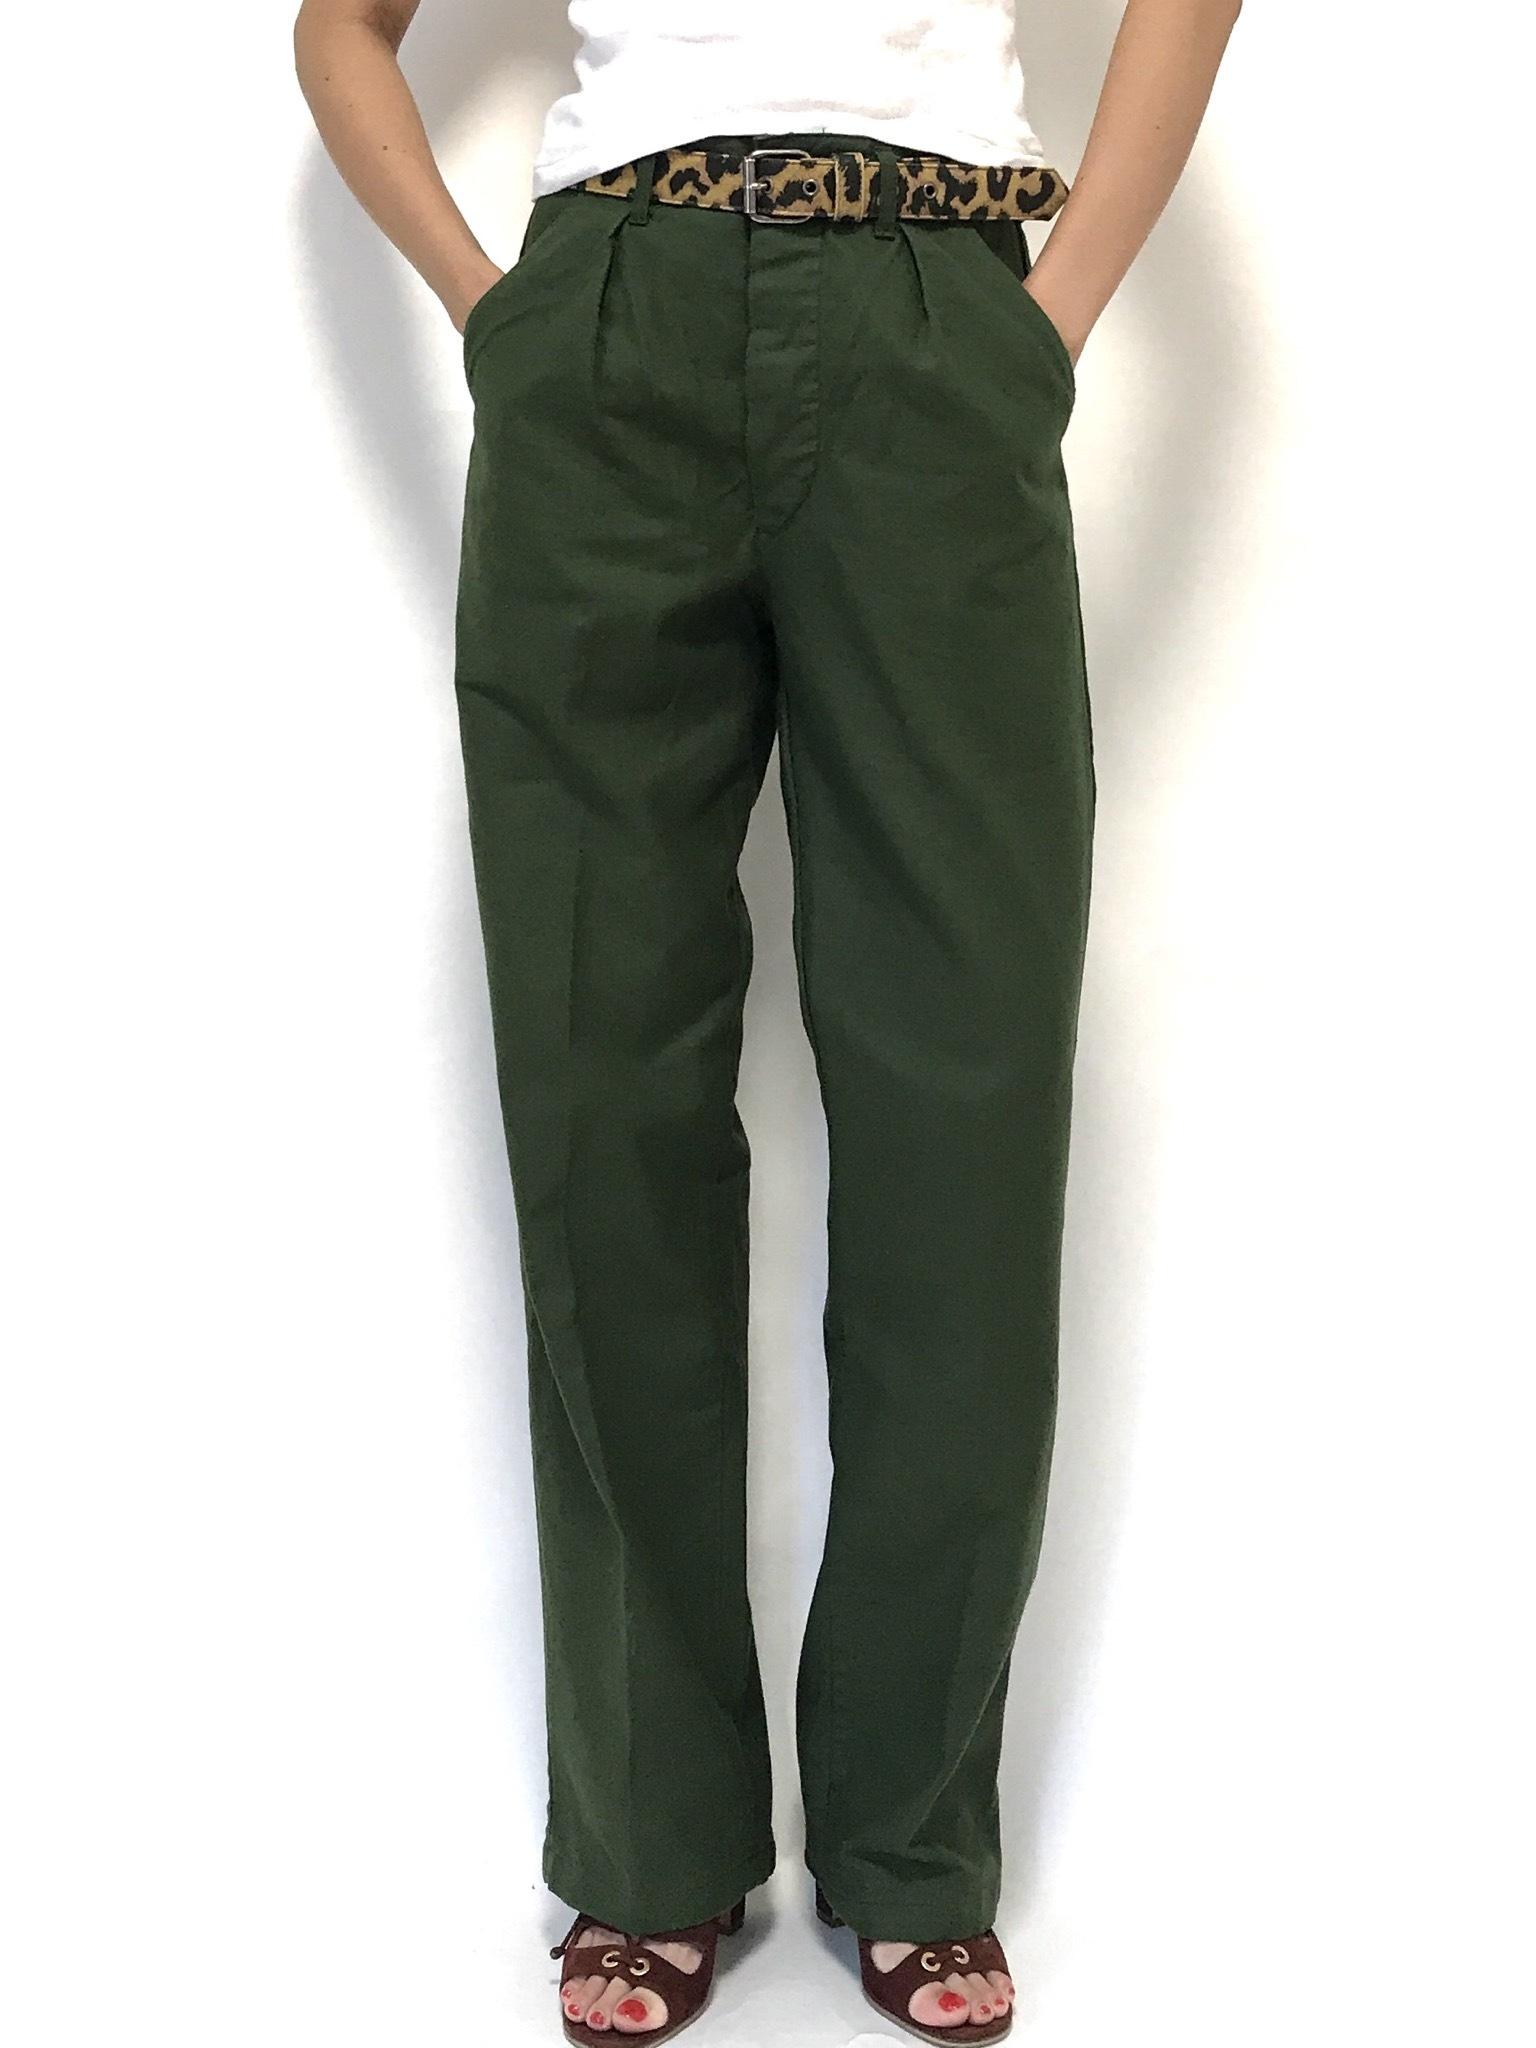 ① 70's Swedish Army Utility Pants C44